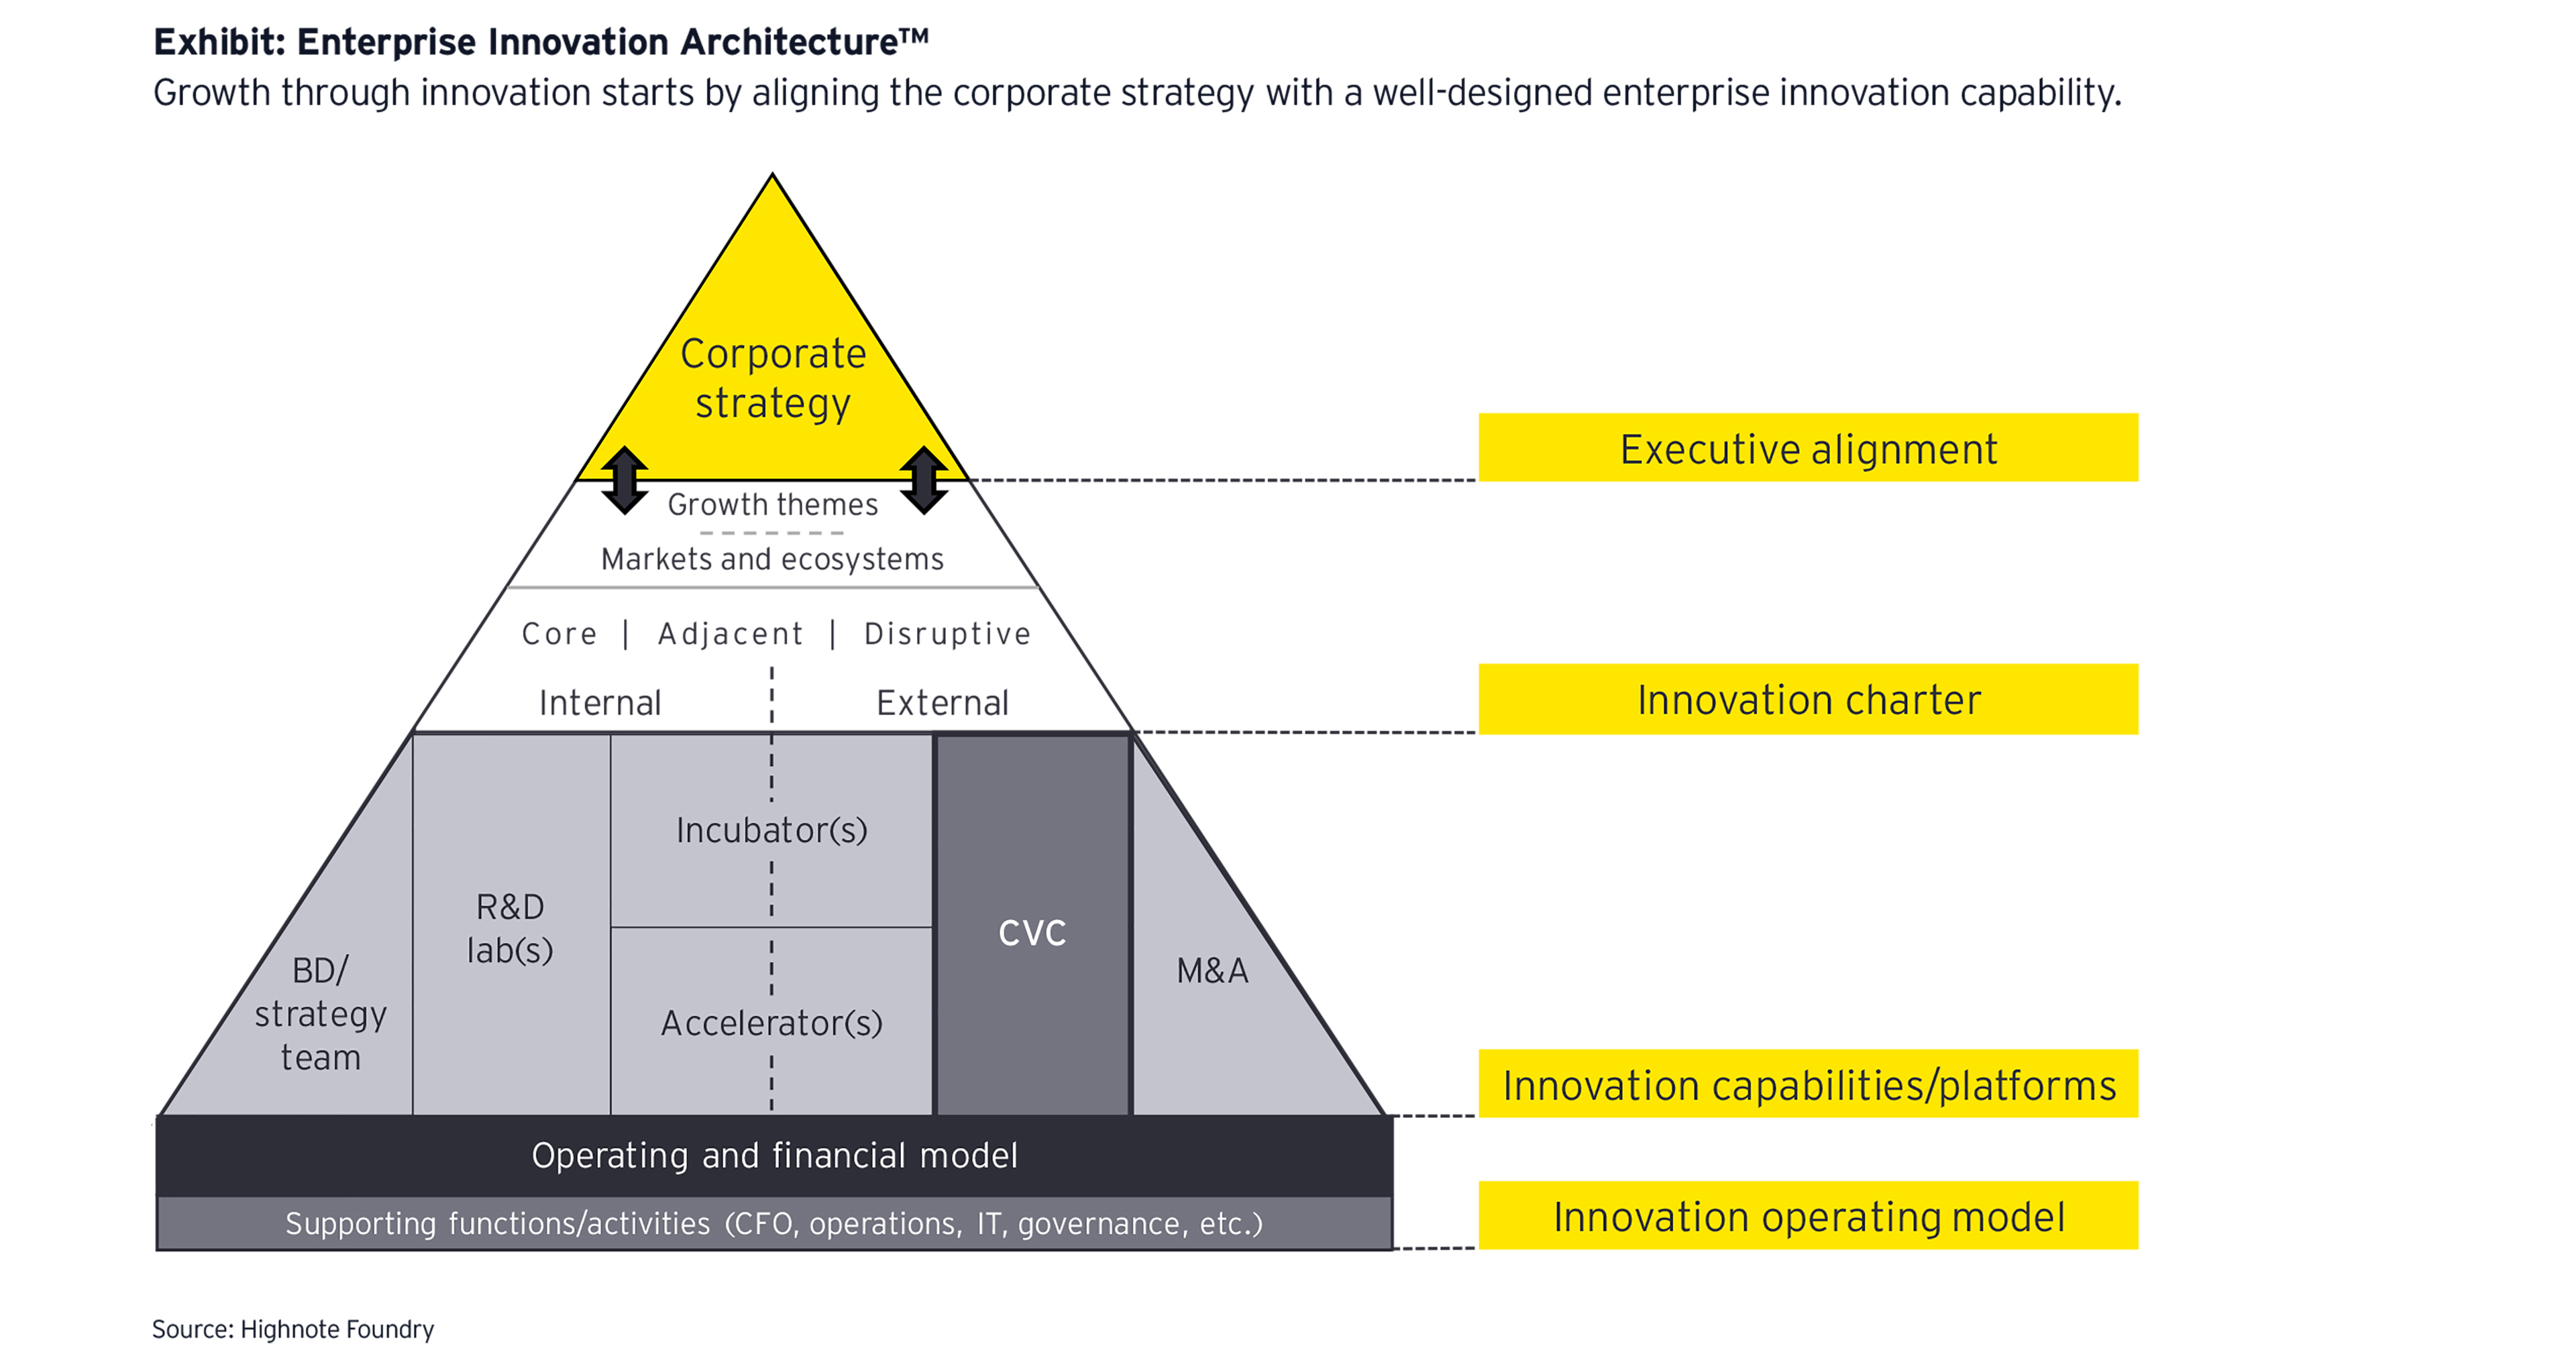 Enterprise innovation architecture